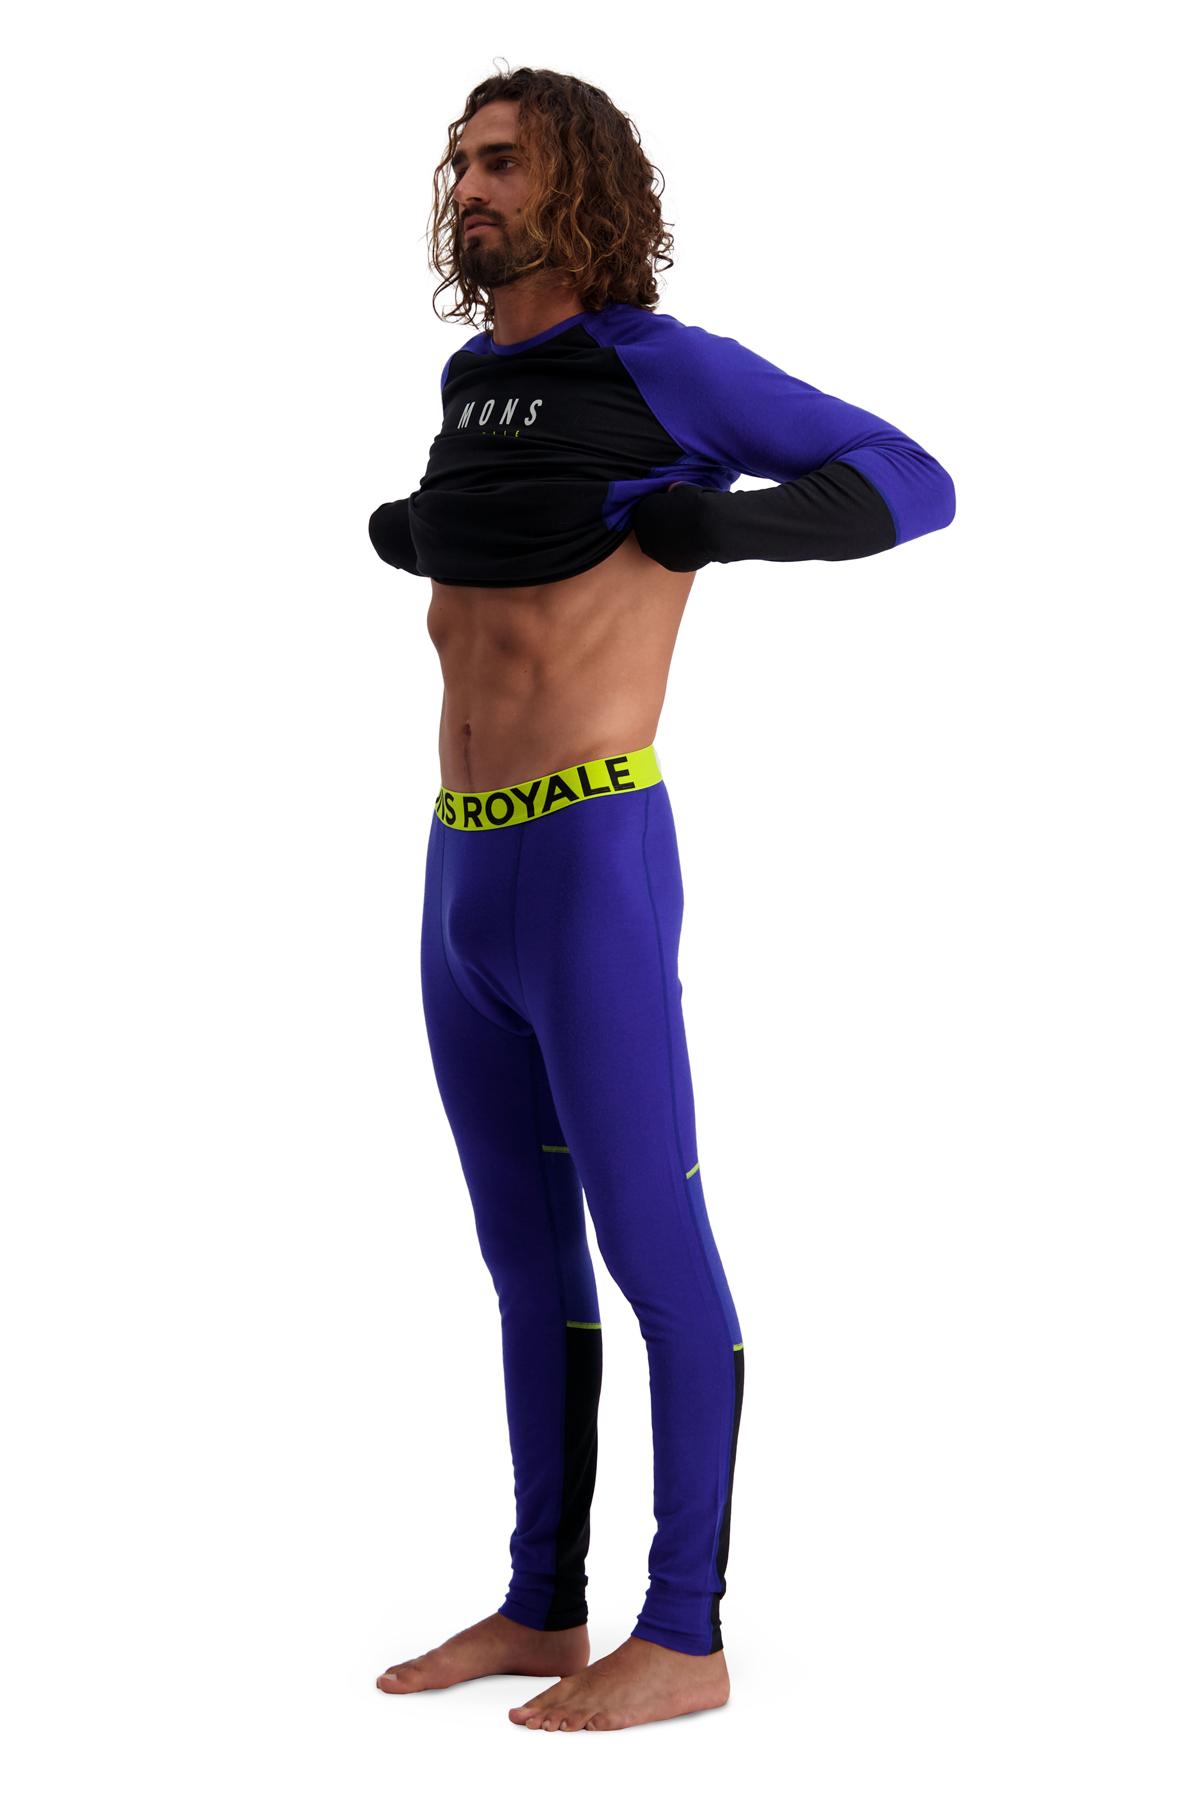 Image of Mons Royale Olympus 3.0 Leggings 100069 - ultra blue/black